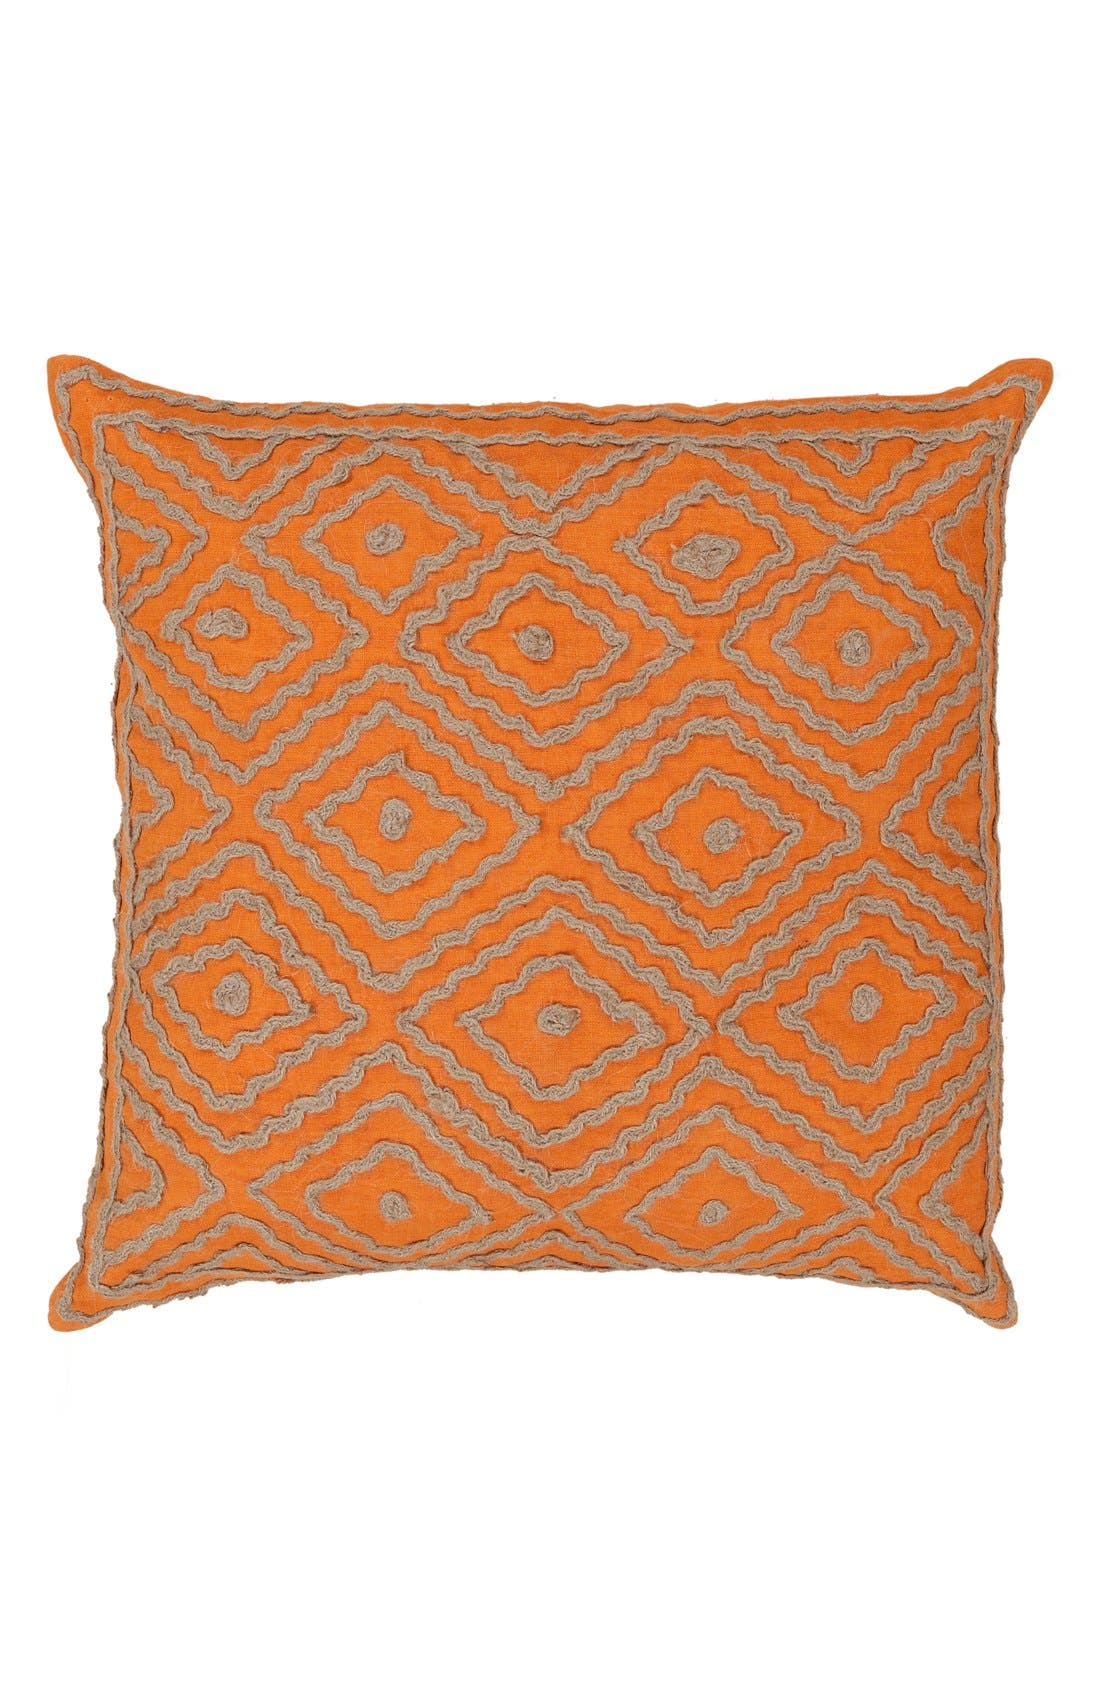 Alternate Image 1 Selected - Surya Home 'Atlas' Pillow